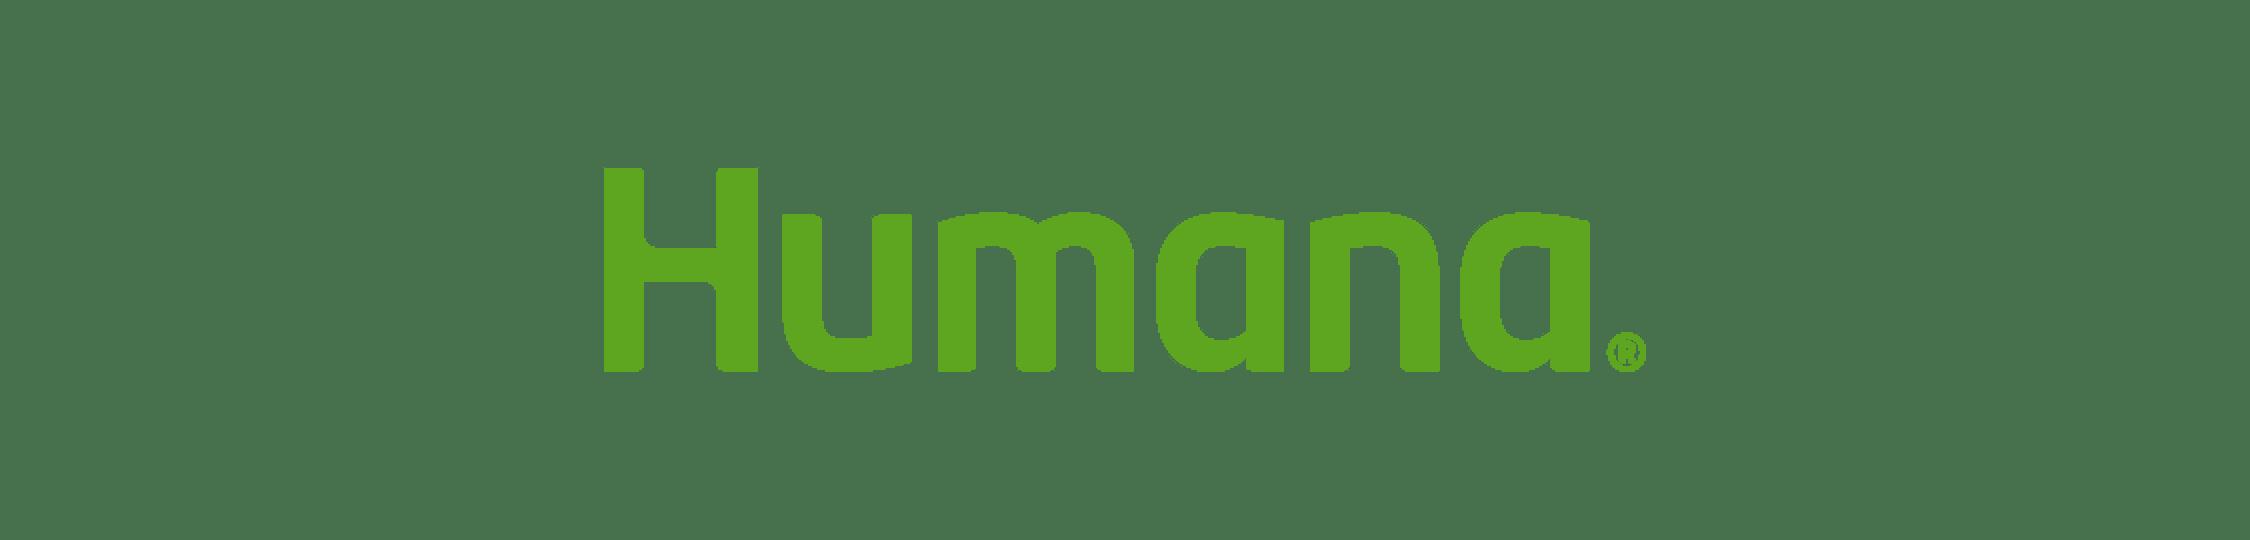 Humana Health Insurance Quotes Humana Health Insurance Quotes  Quotes Of The Day